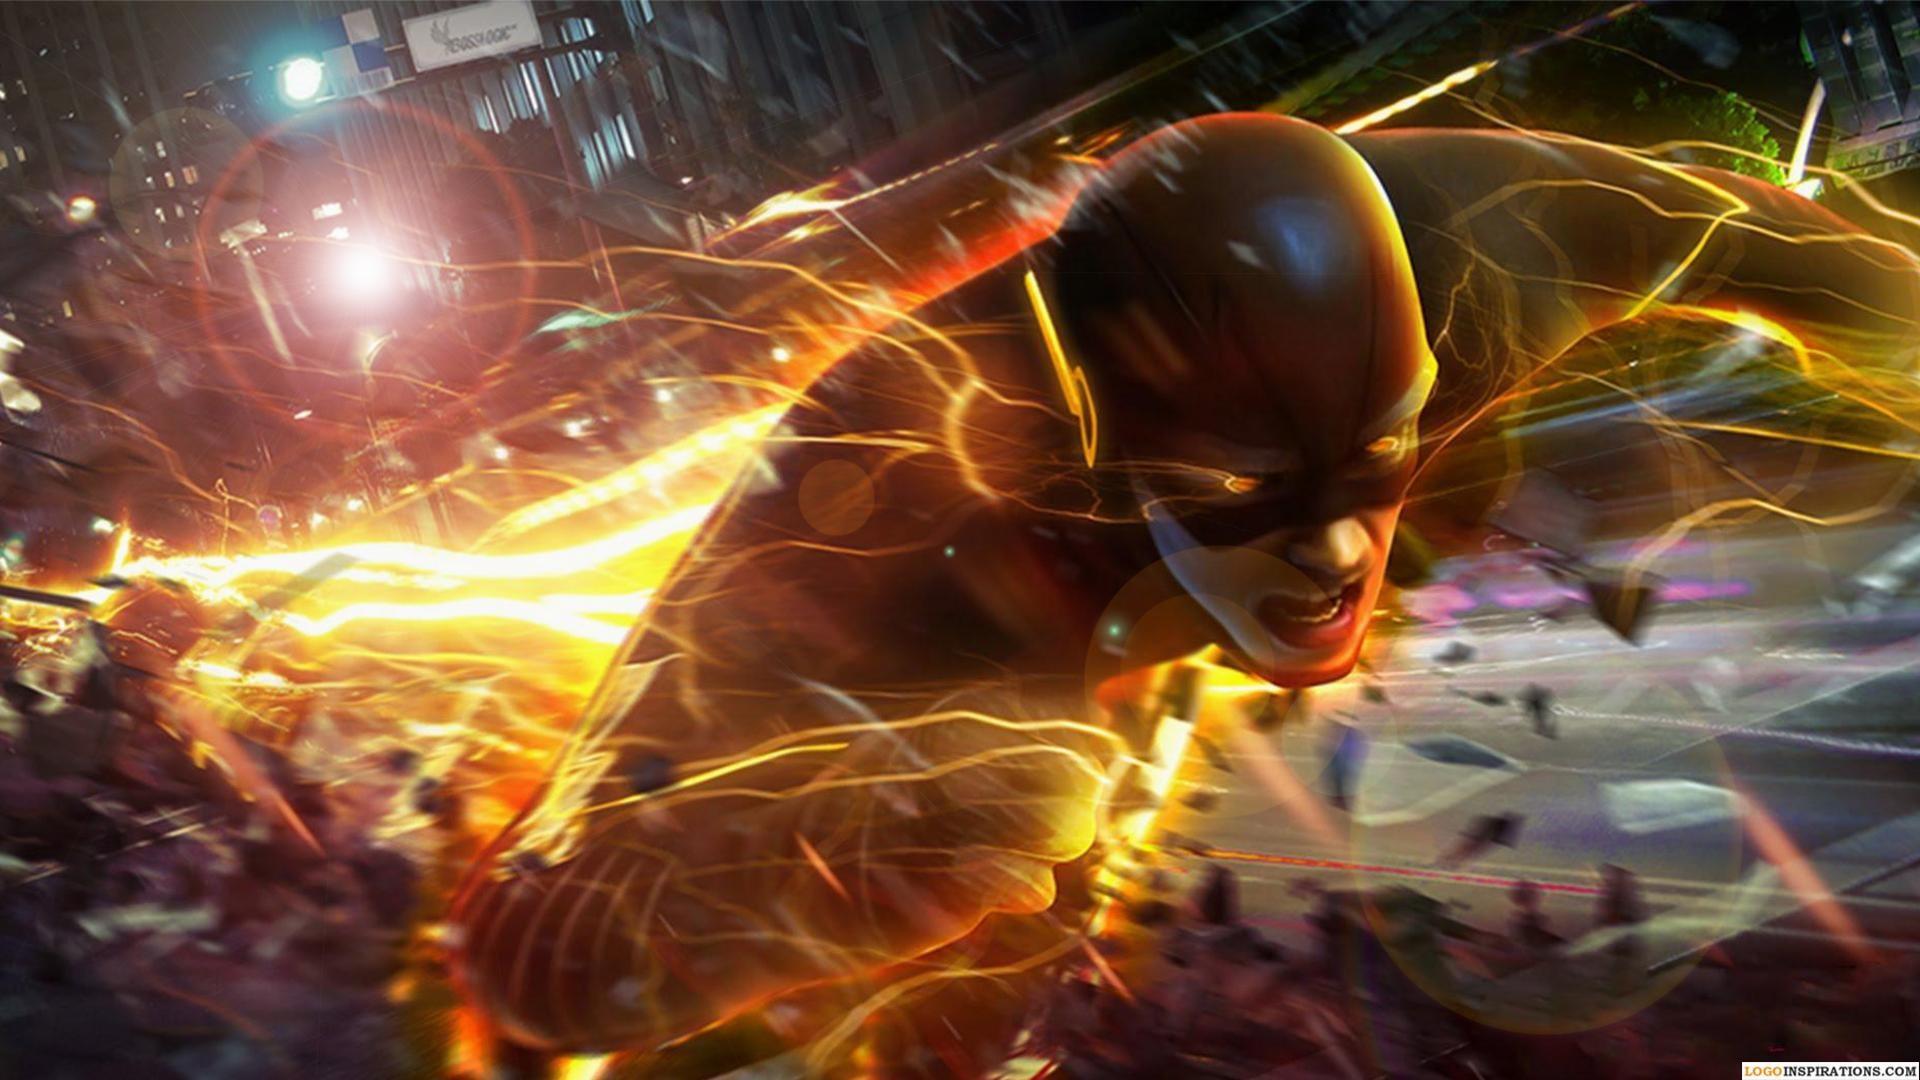 The-Flash-CW-HD-wallpaper-wp20010305